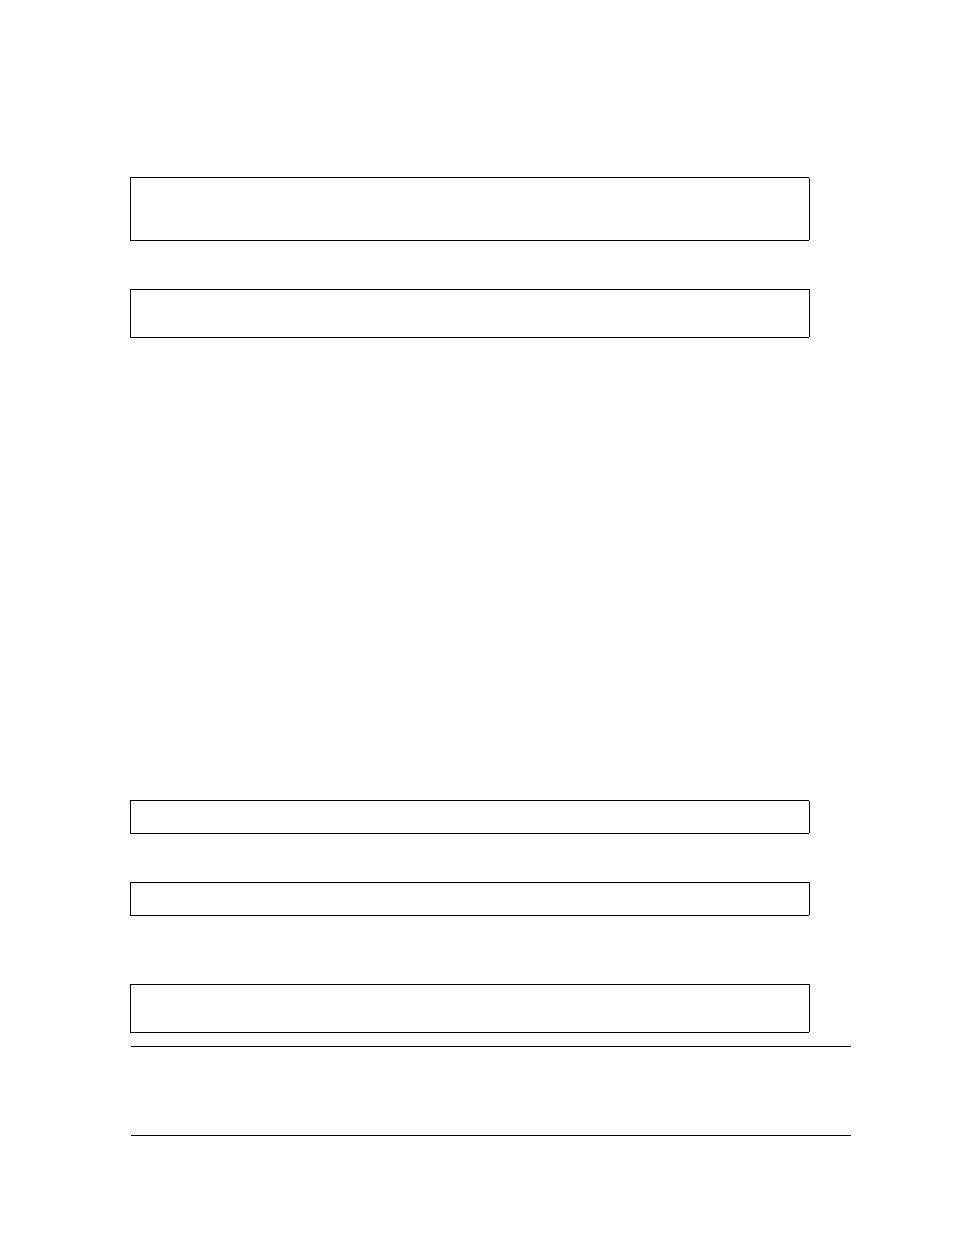 Hp nonstop sql programming manual for tal pdf.